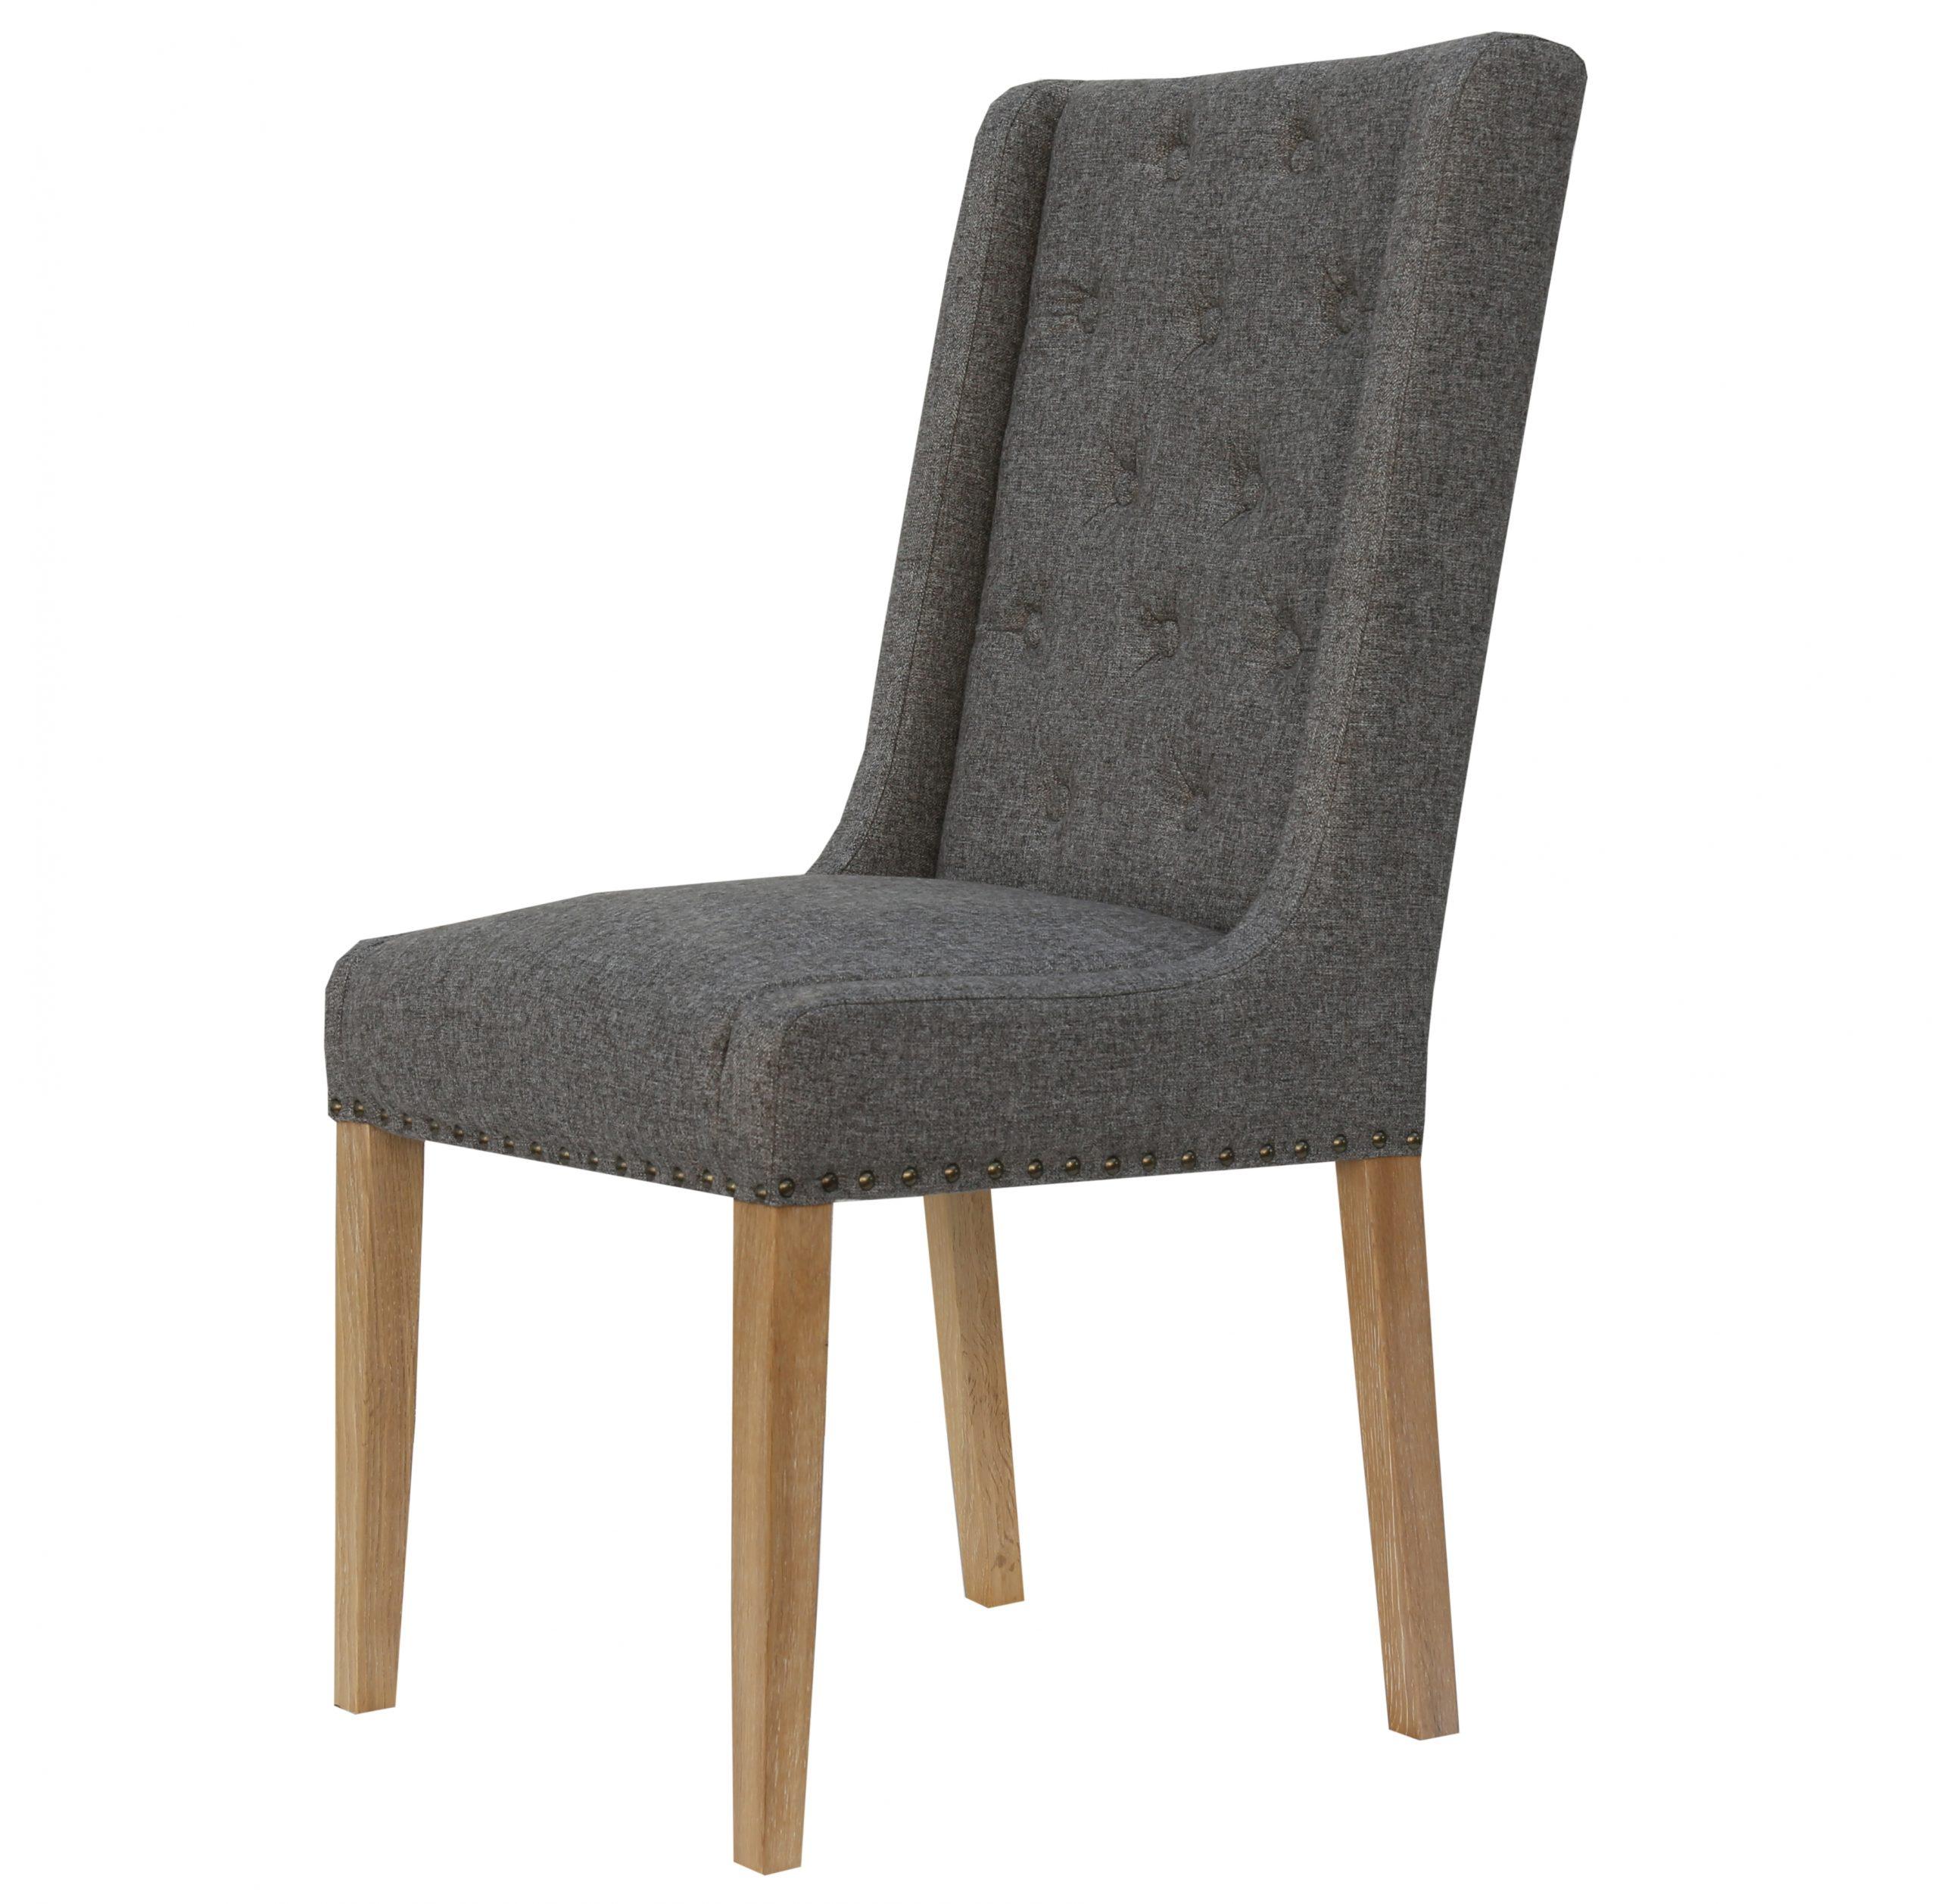 Kensington Wing back button grey linen Dining chair